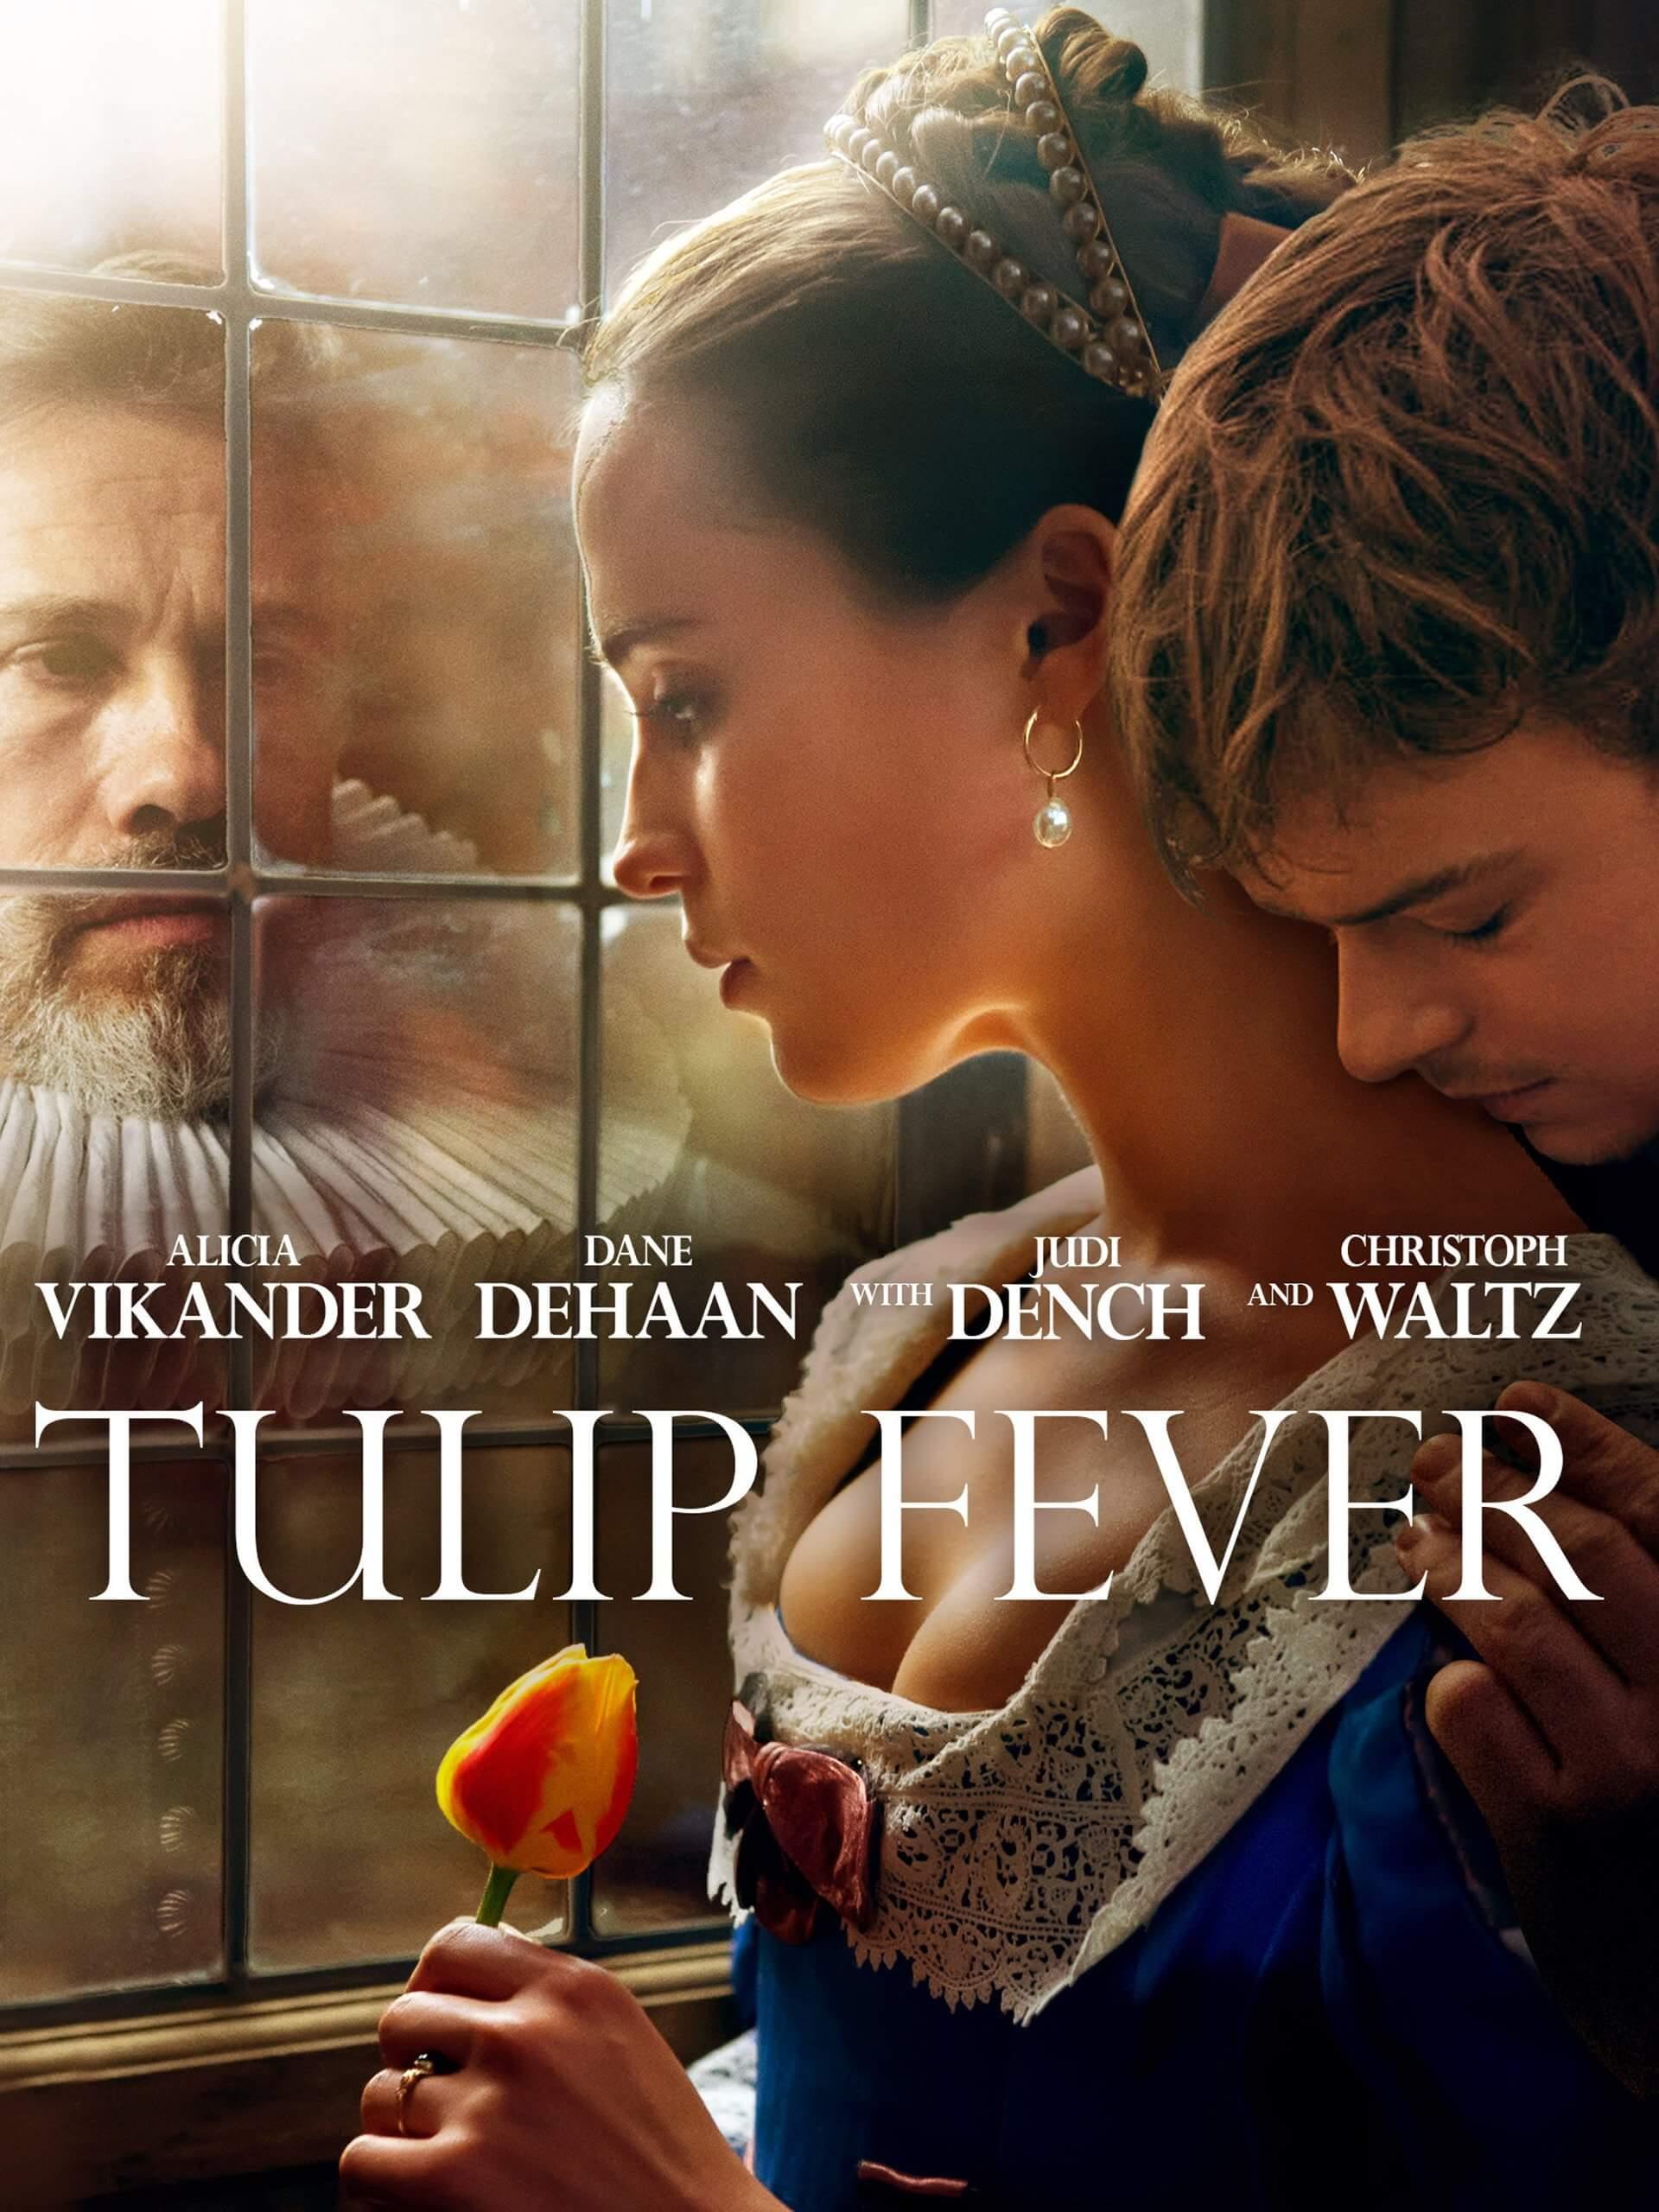 مشاهدة فيلم Tulip Fever 2017 مترجم للكبار فقط